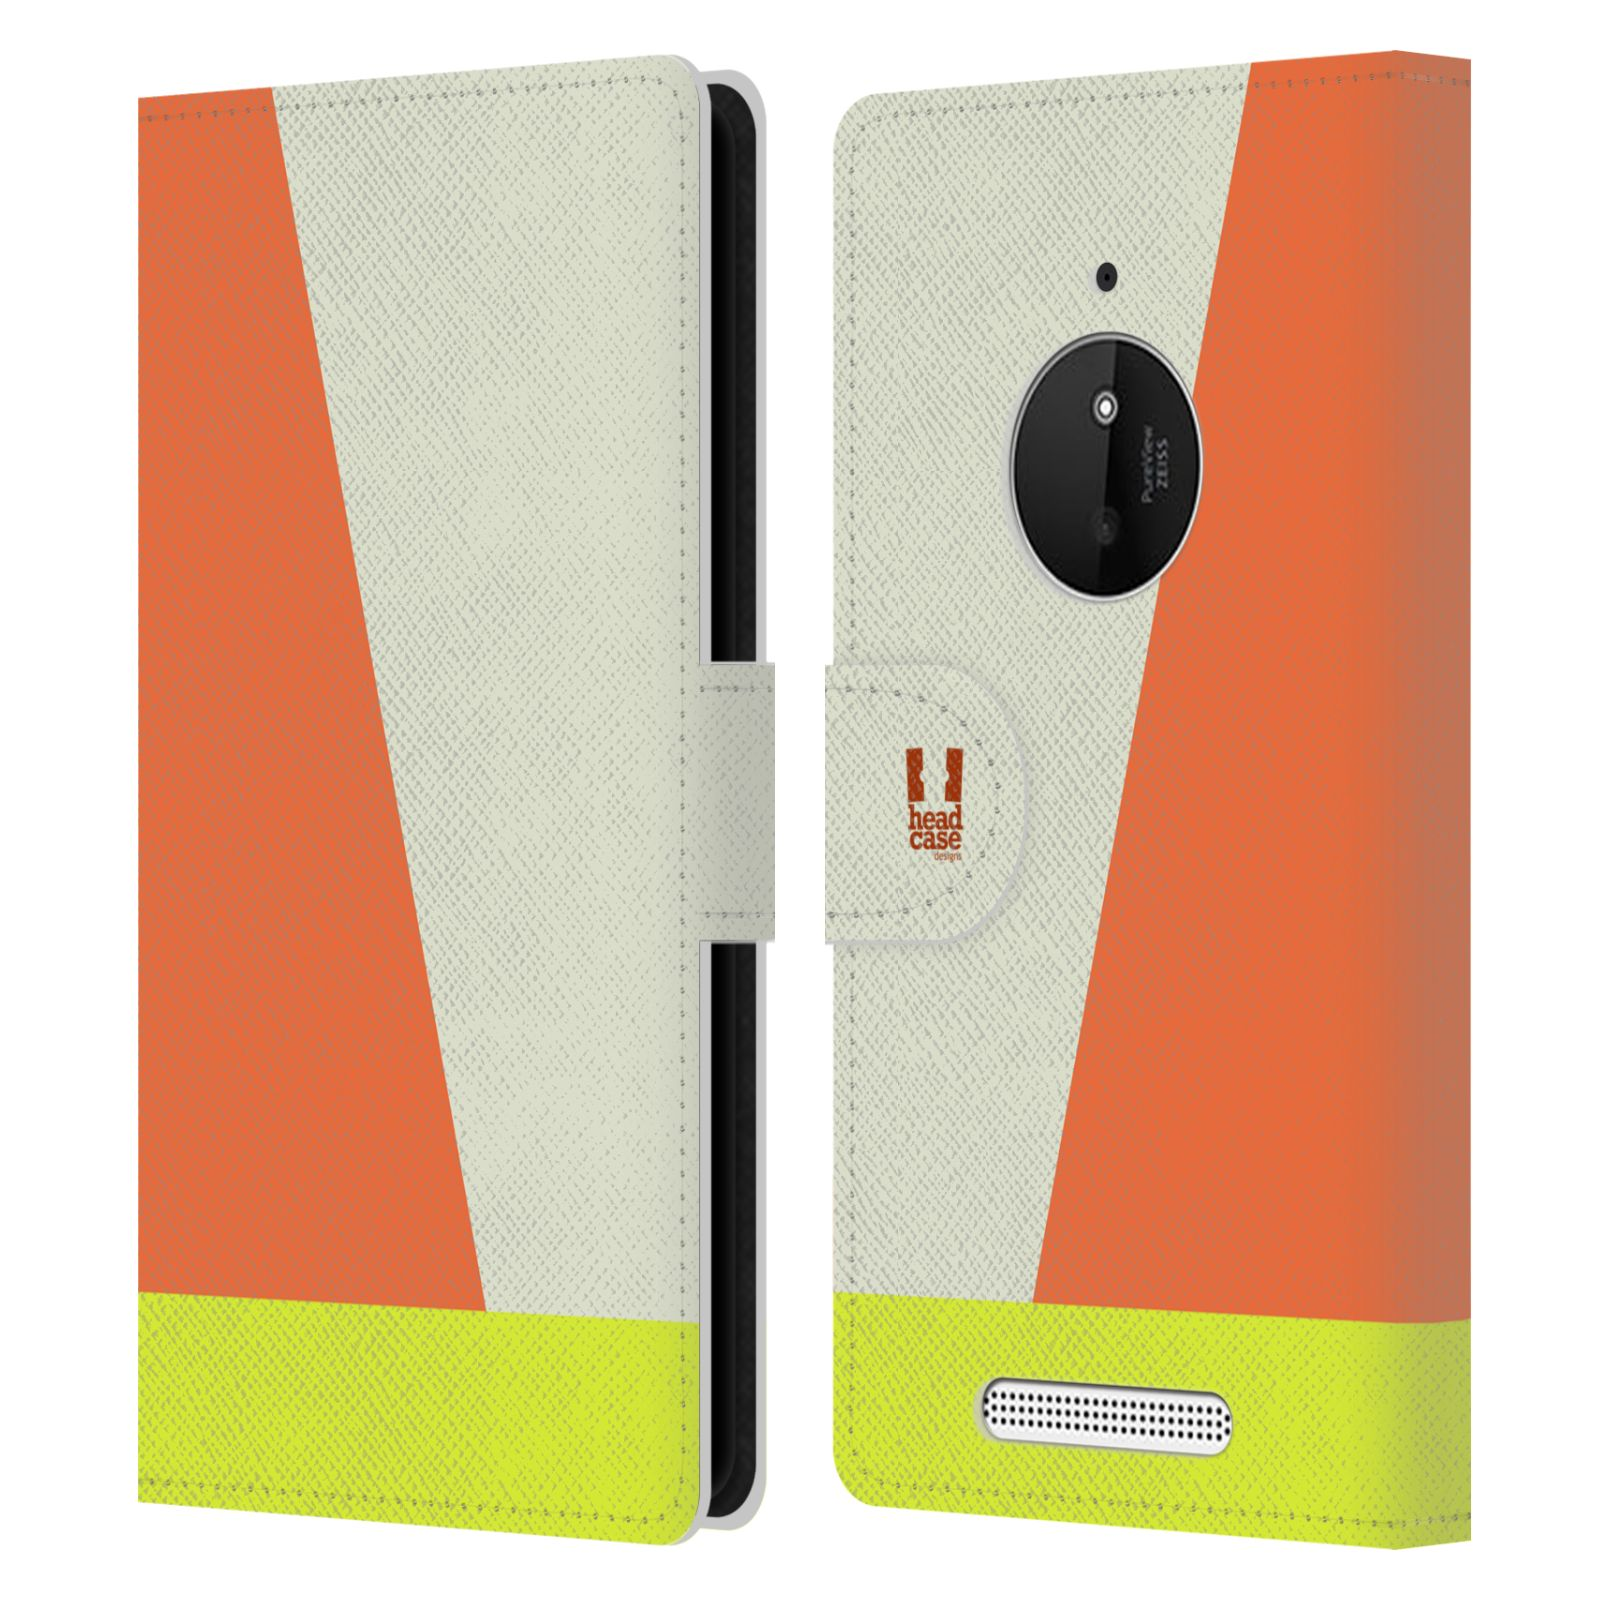 HEAD CASE Flipové pouzdro pro mobil Nokia LUMIA 830 barevné tvary slonová kost